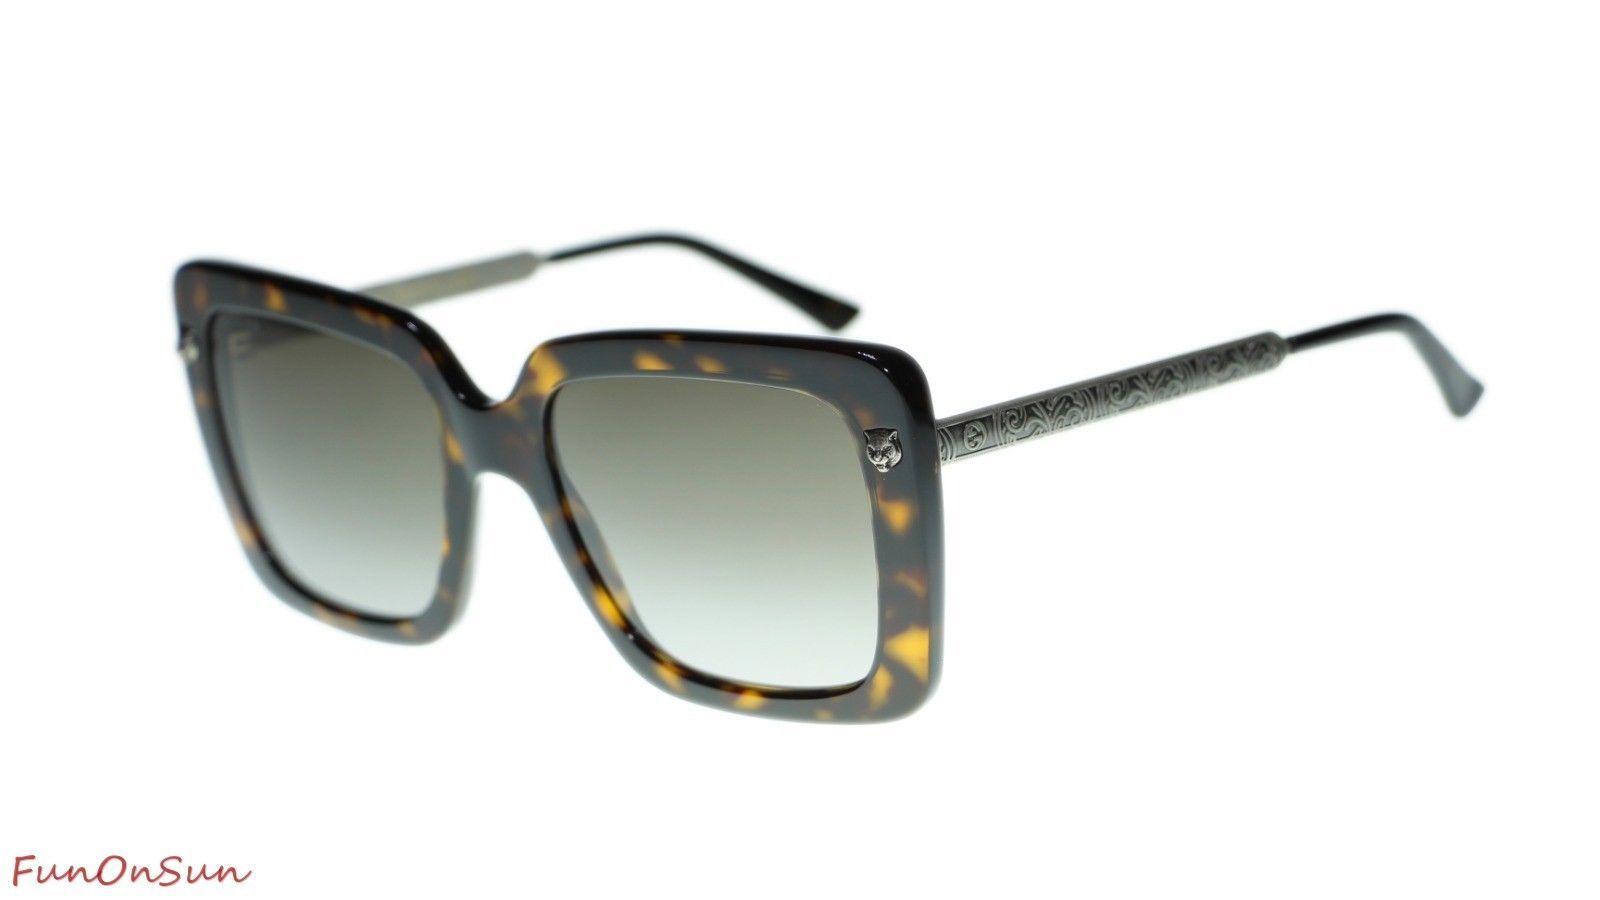 bfd2fbb3b5c 10. 10. Previous. Gucci Women s Sunglasses GG0216S 002 Havana Brown  Gradient Lens Square 53mm. Gucci Women s ...